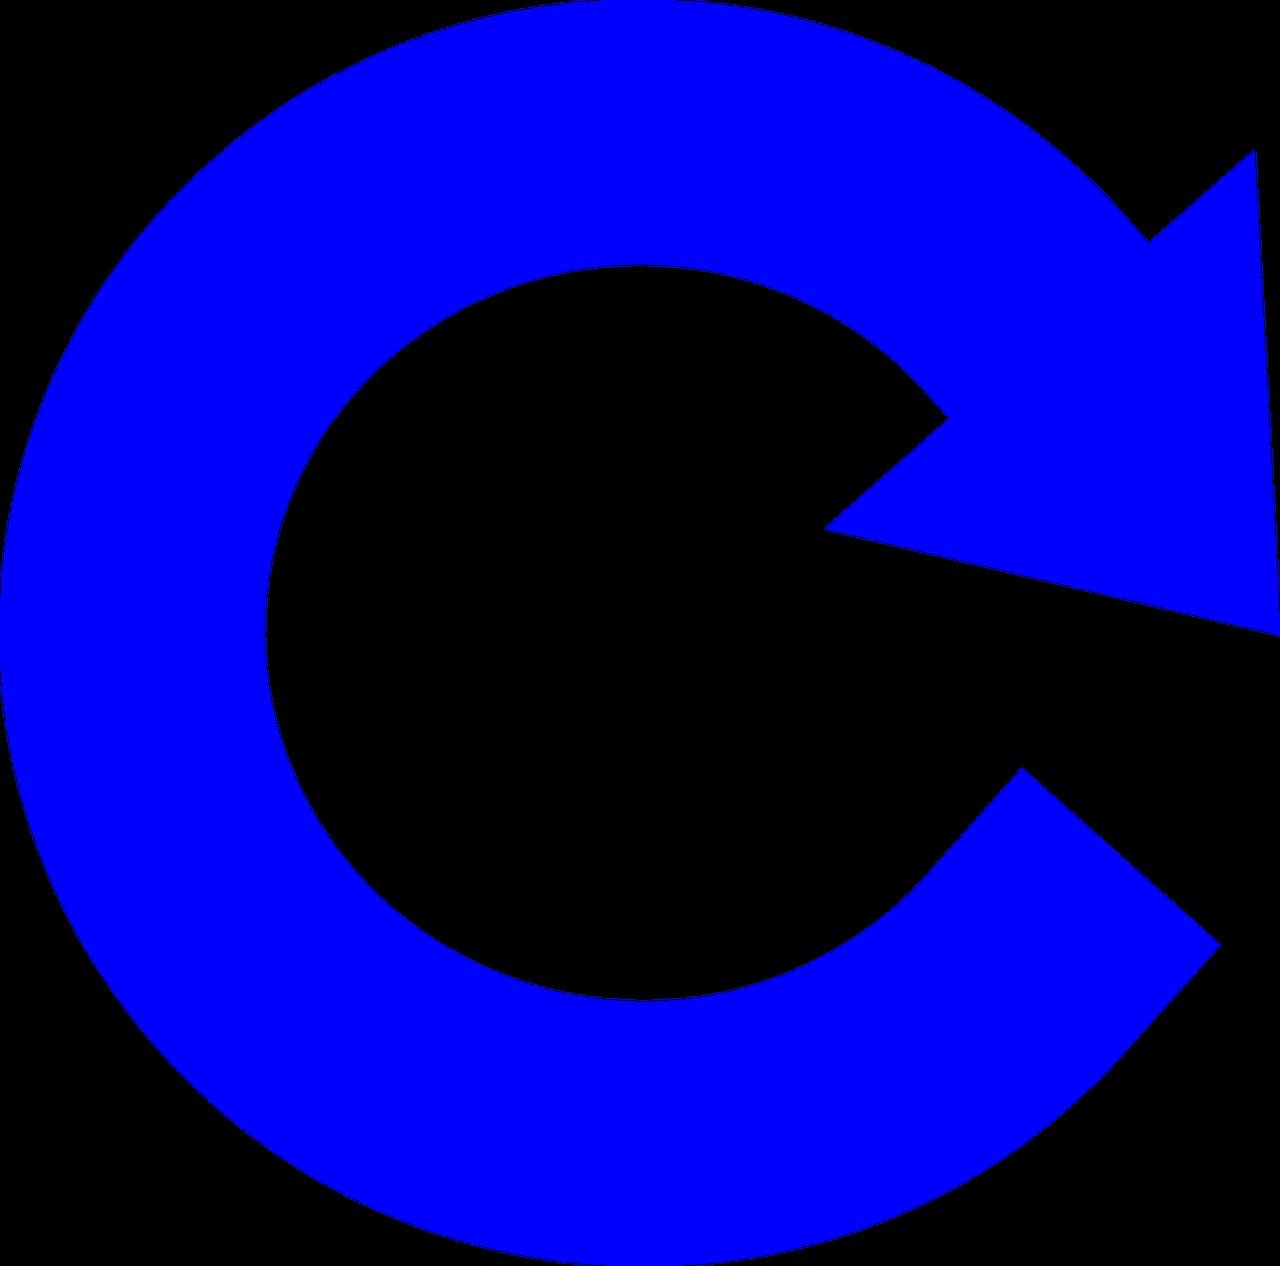 retention symbol